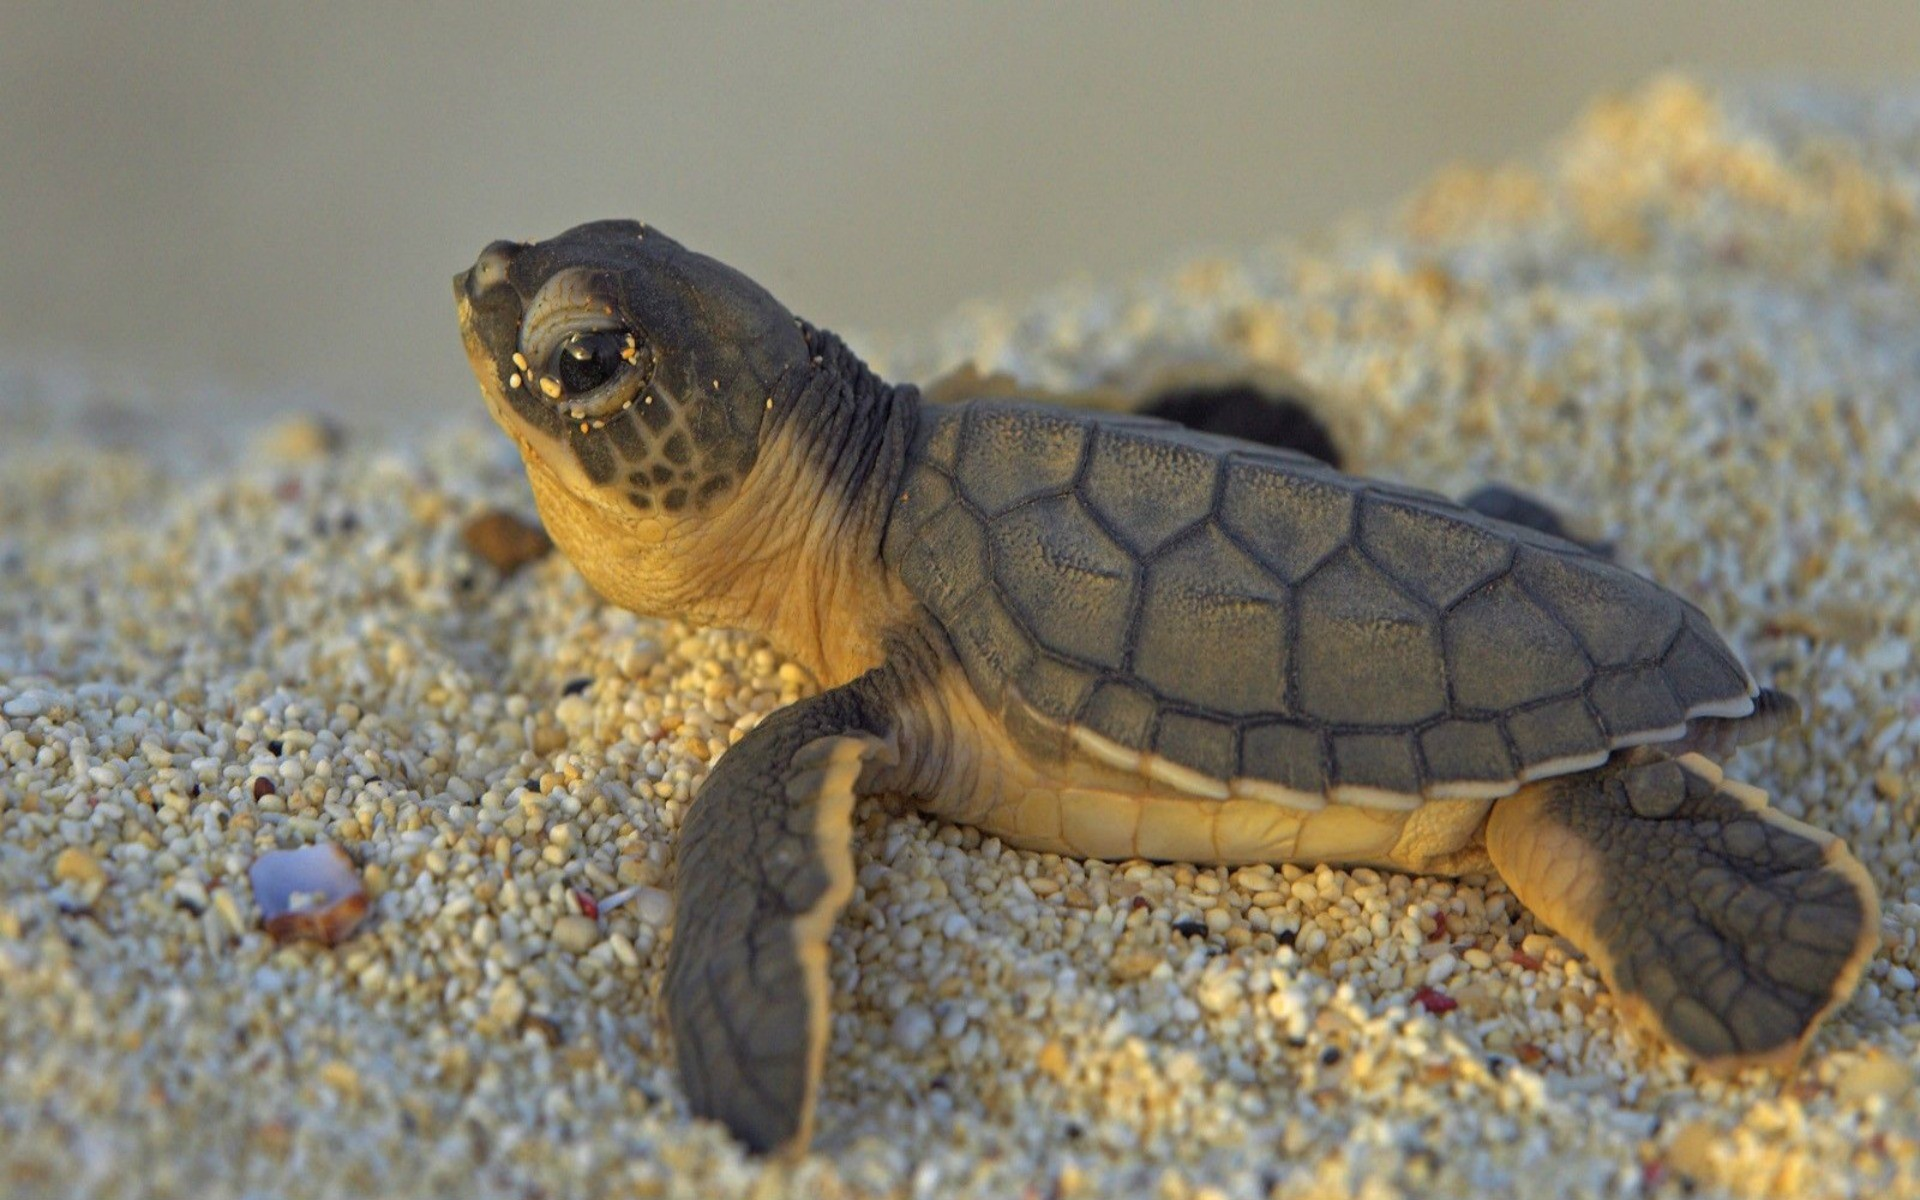 3d Animal Wallpapers Desktop Free Download Cute Turtle Wallpaper 59 Images